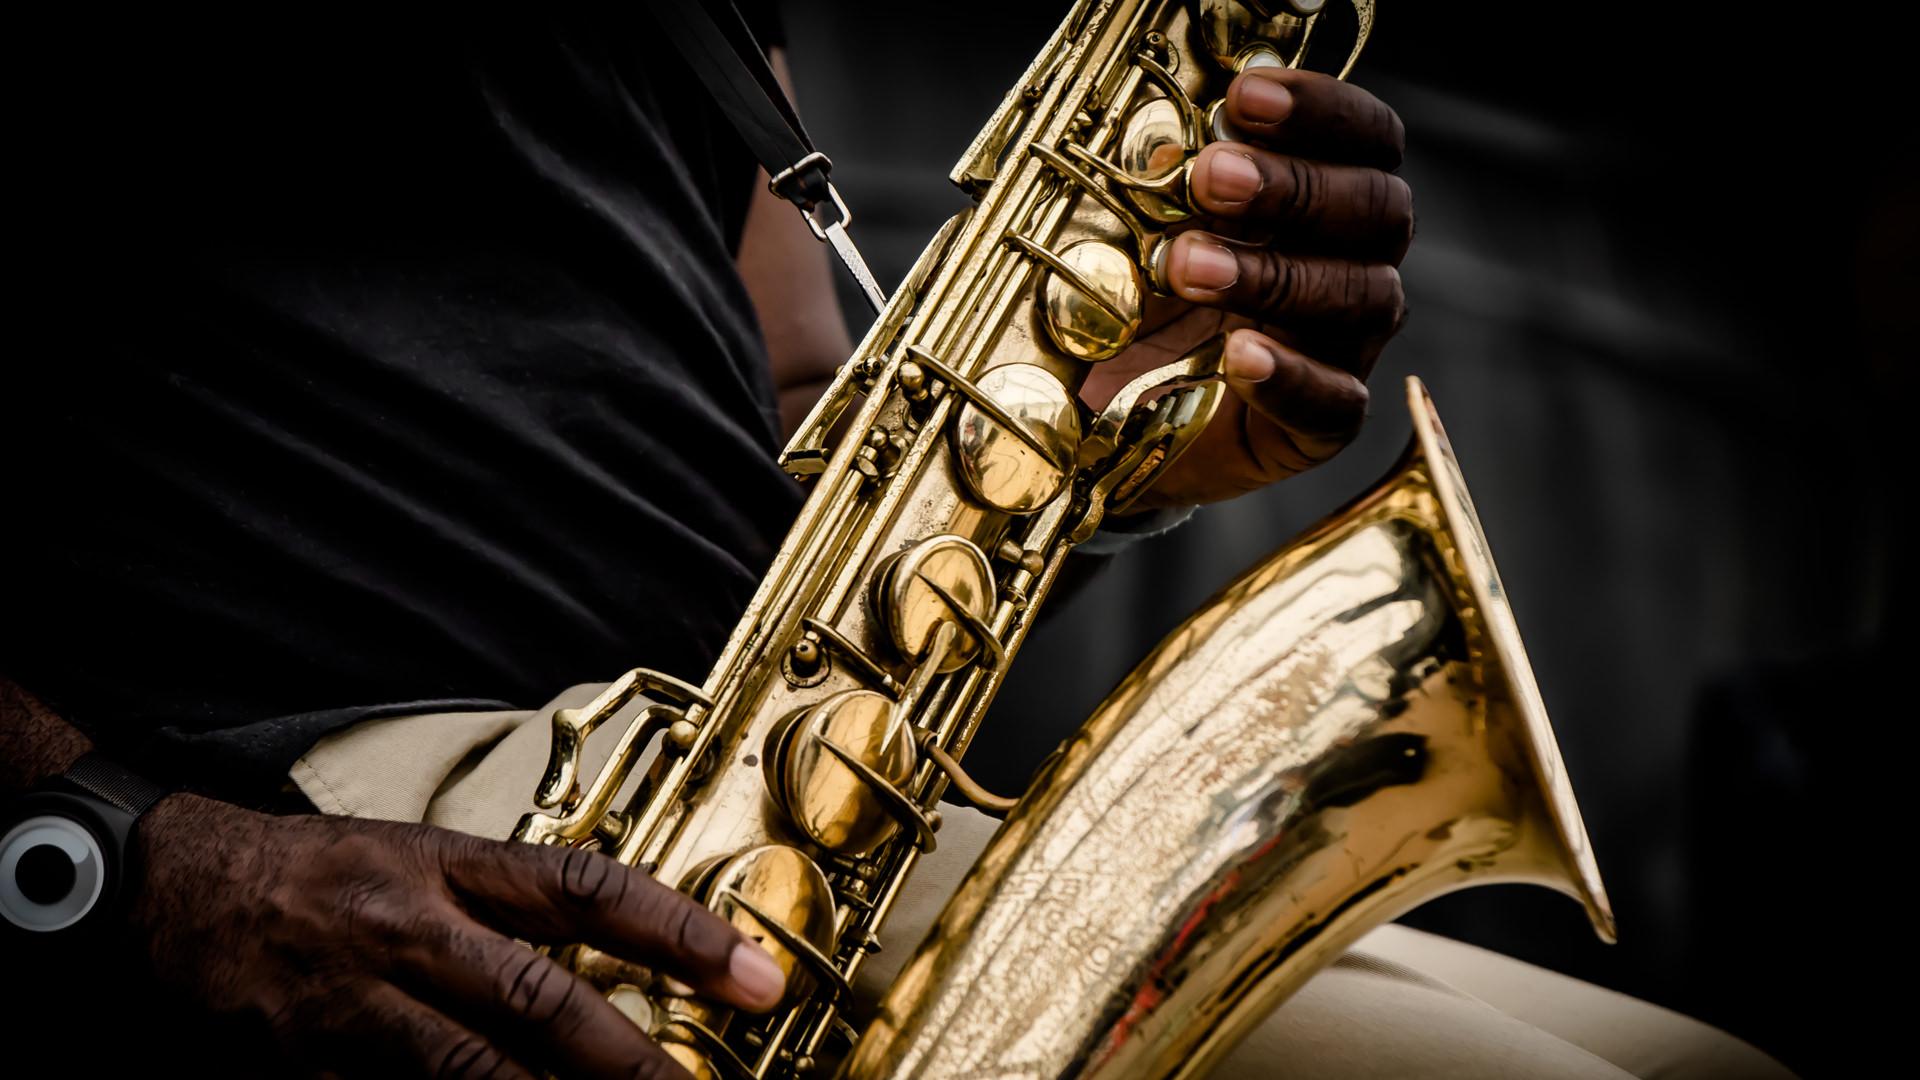 Modern Müziğin Kilit Taşı: Blues